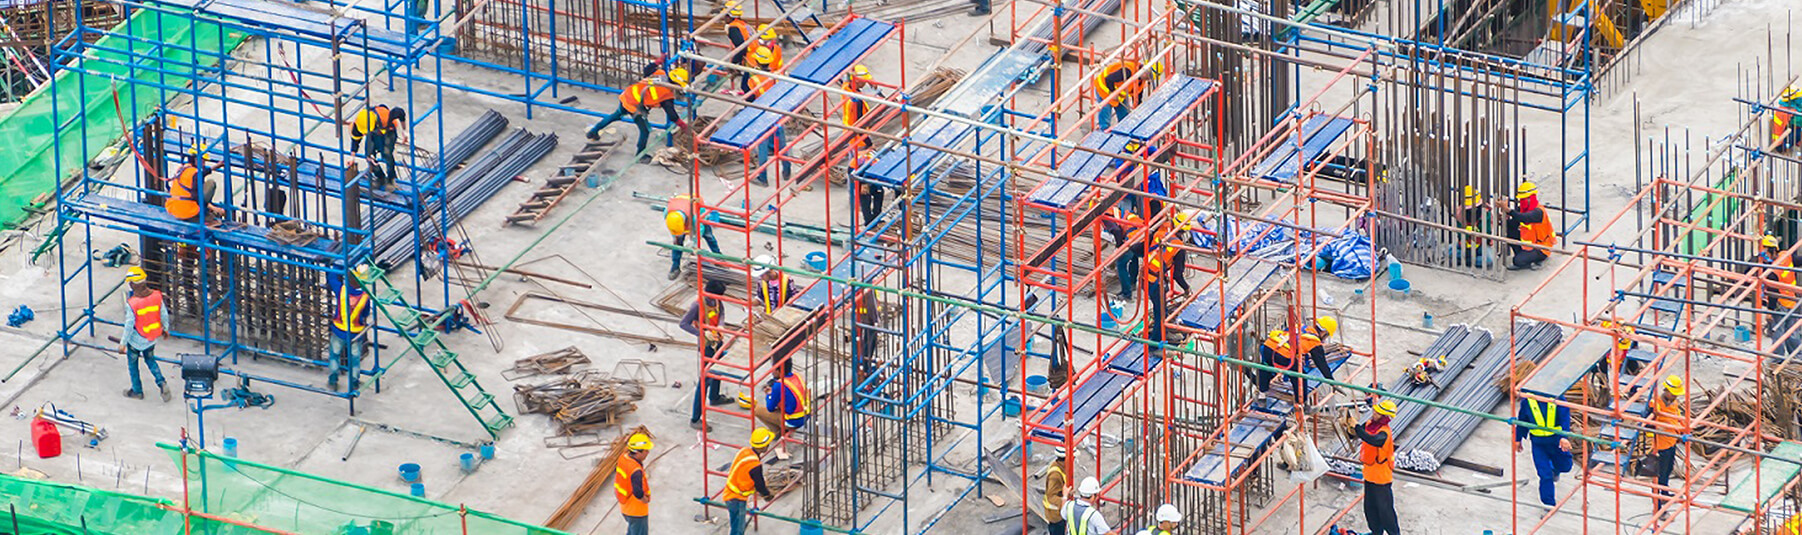 Construction Site Access Control